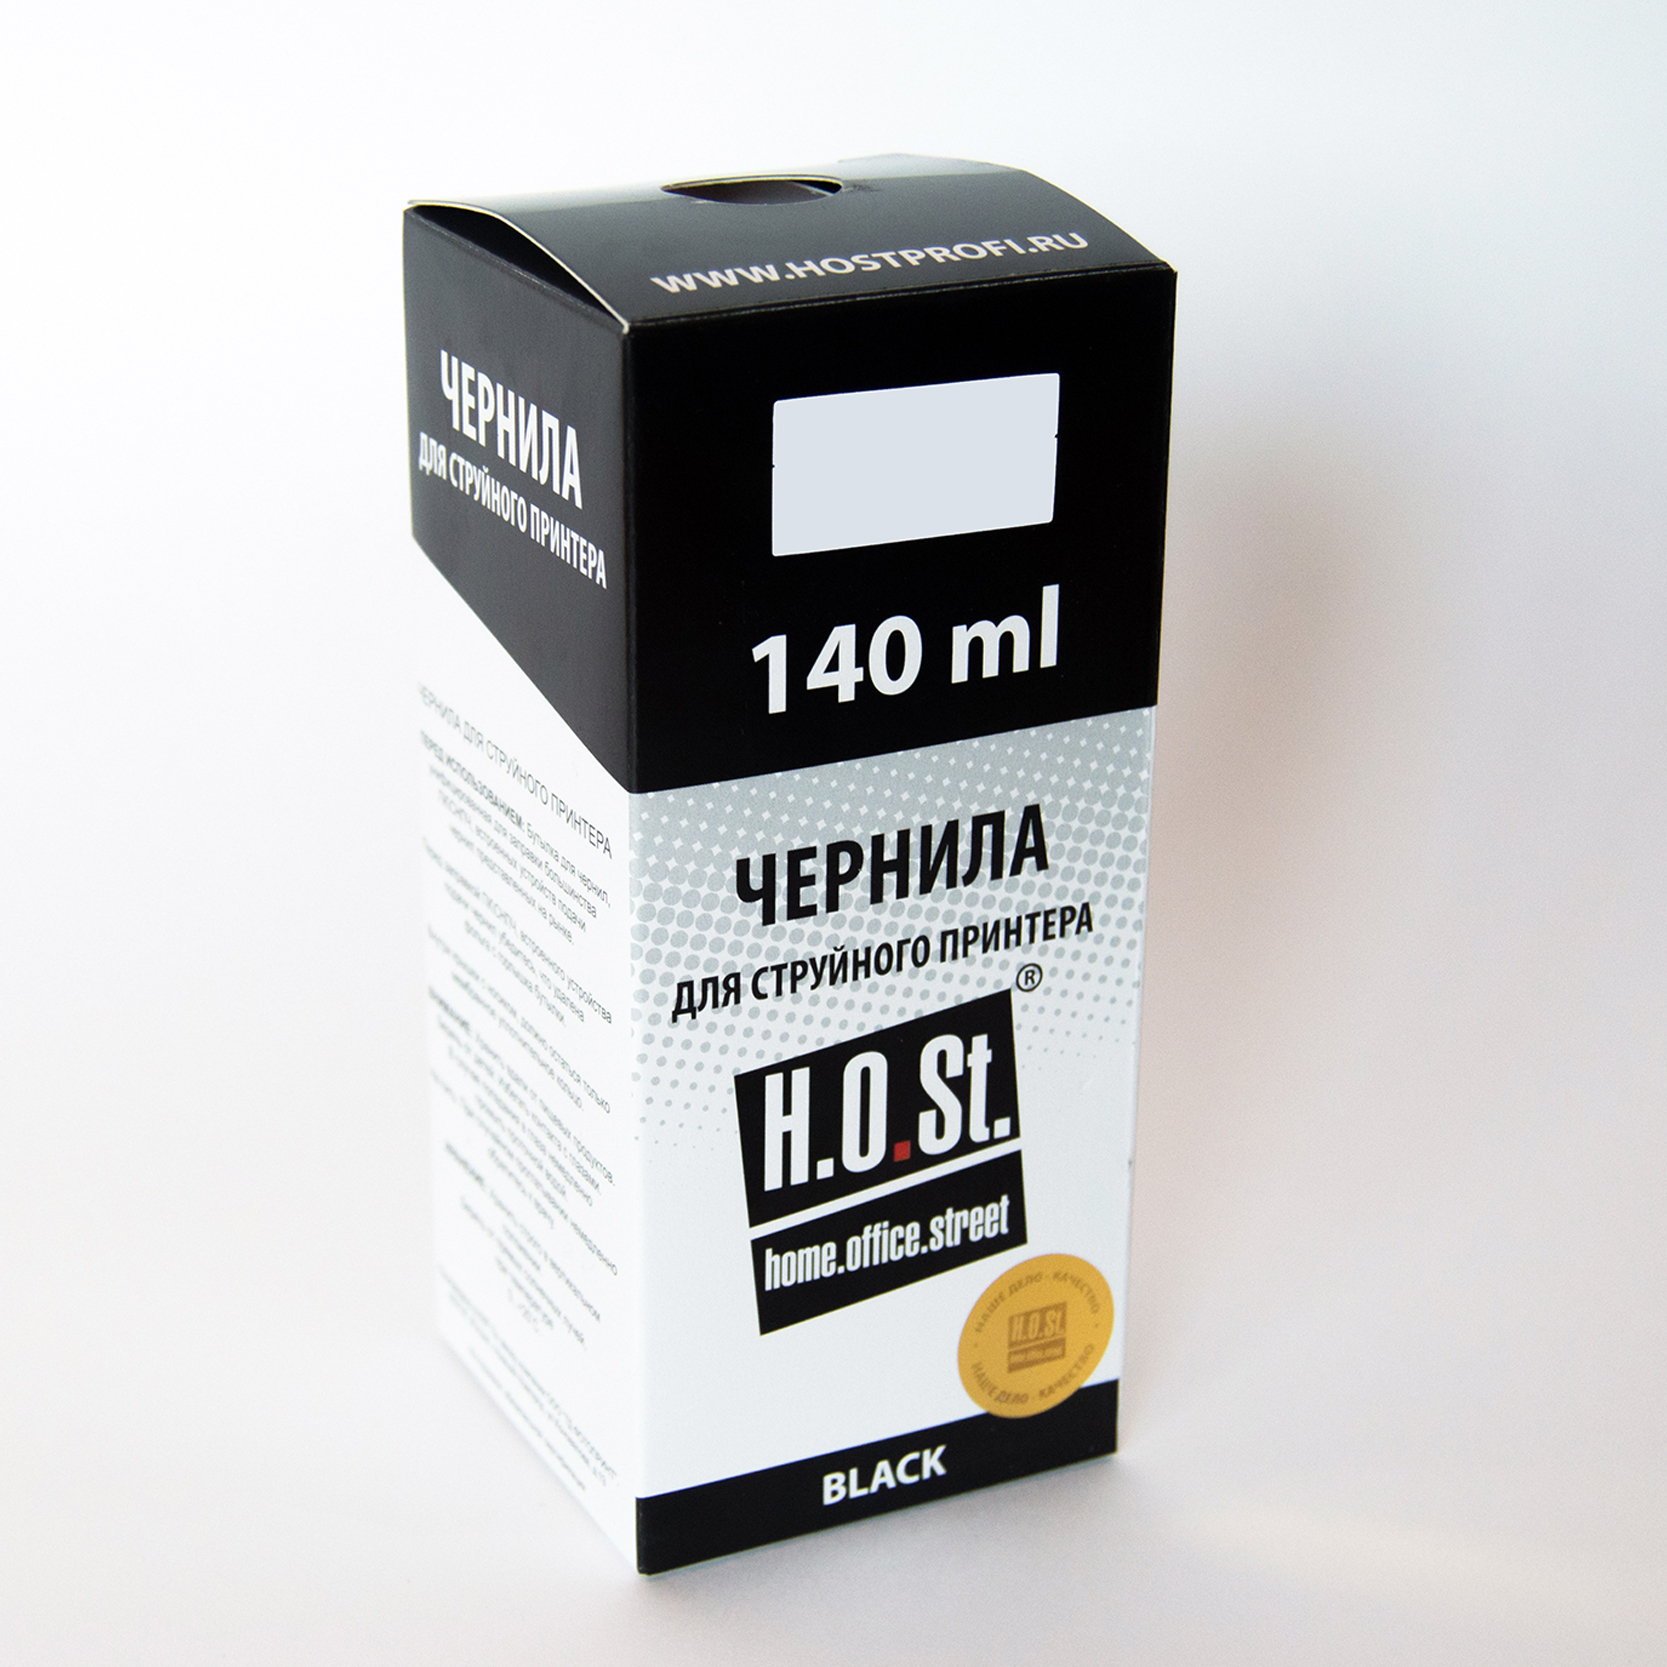 Чернила  HOSt для Canon Pixma iP8 Black пигмент Премиум 140ml